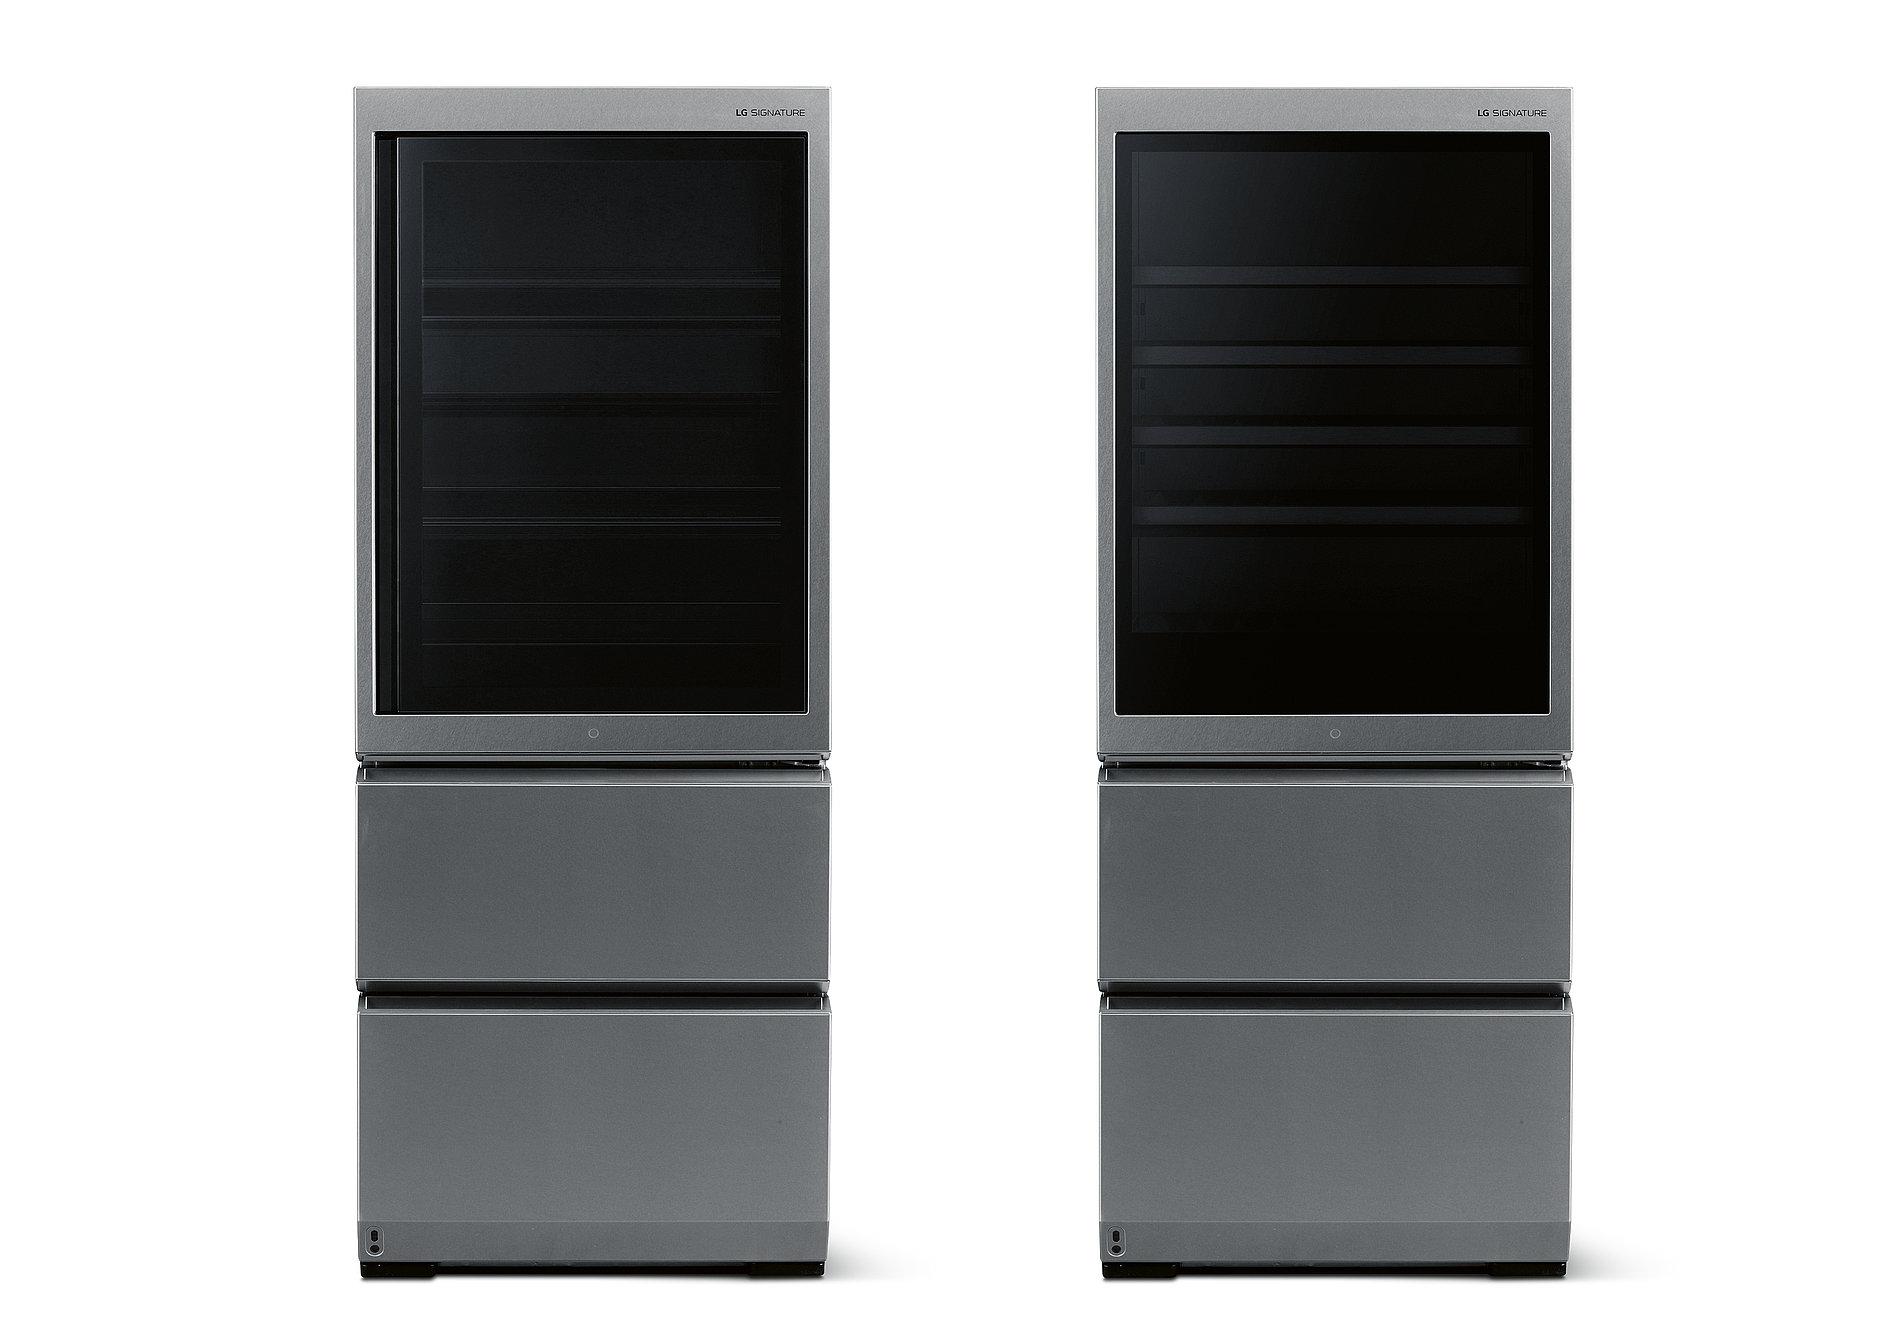 LG SIGNATURE Bottom Freezer | Red Dot Design Award